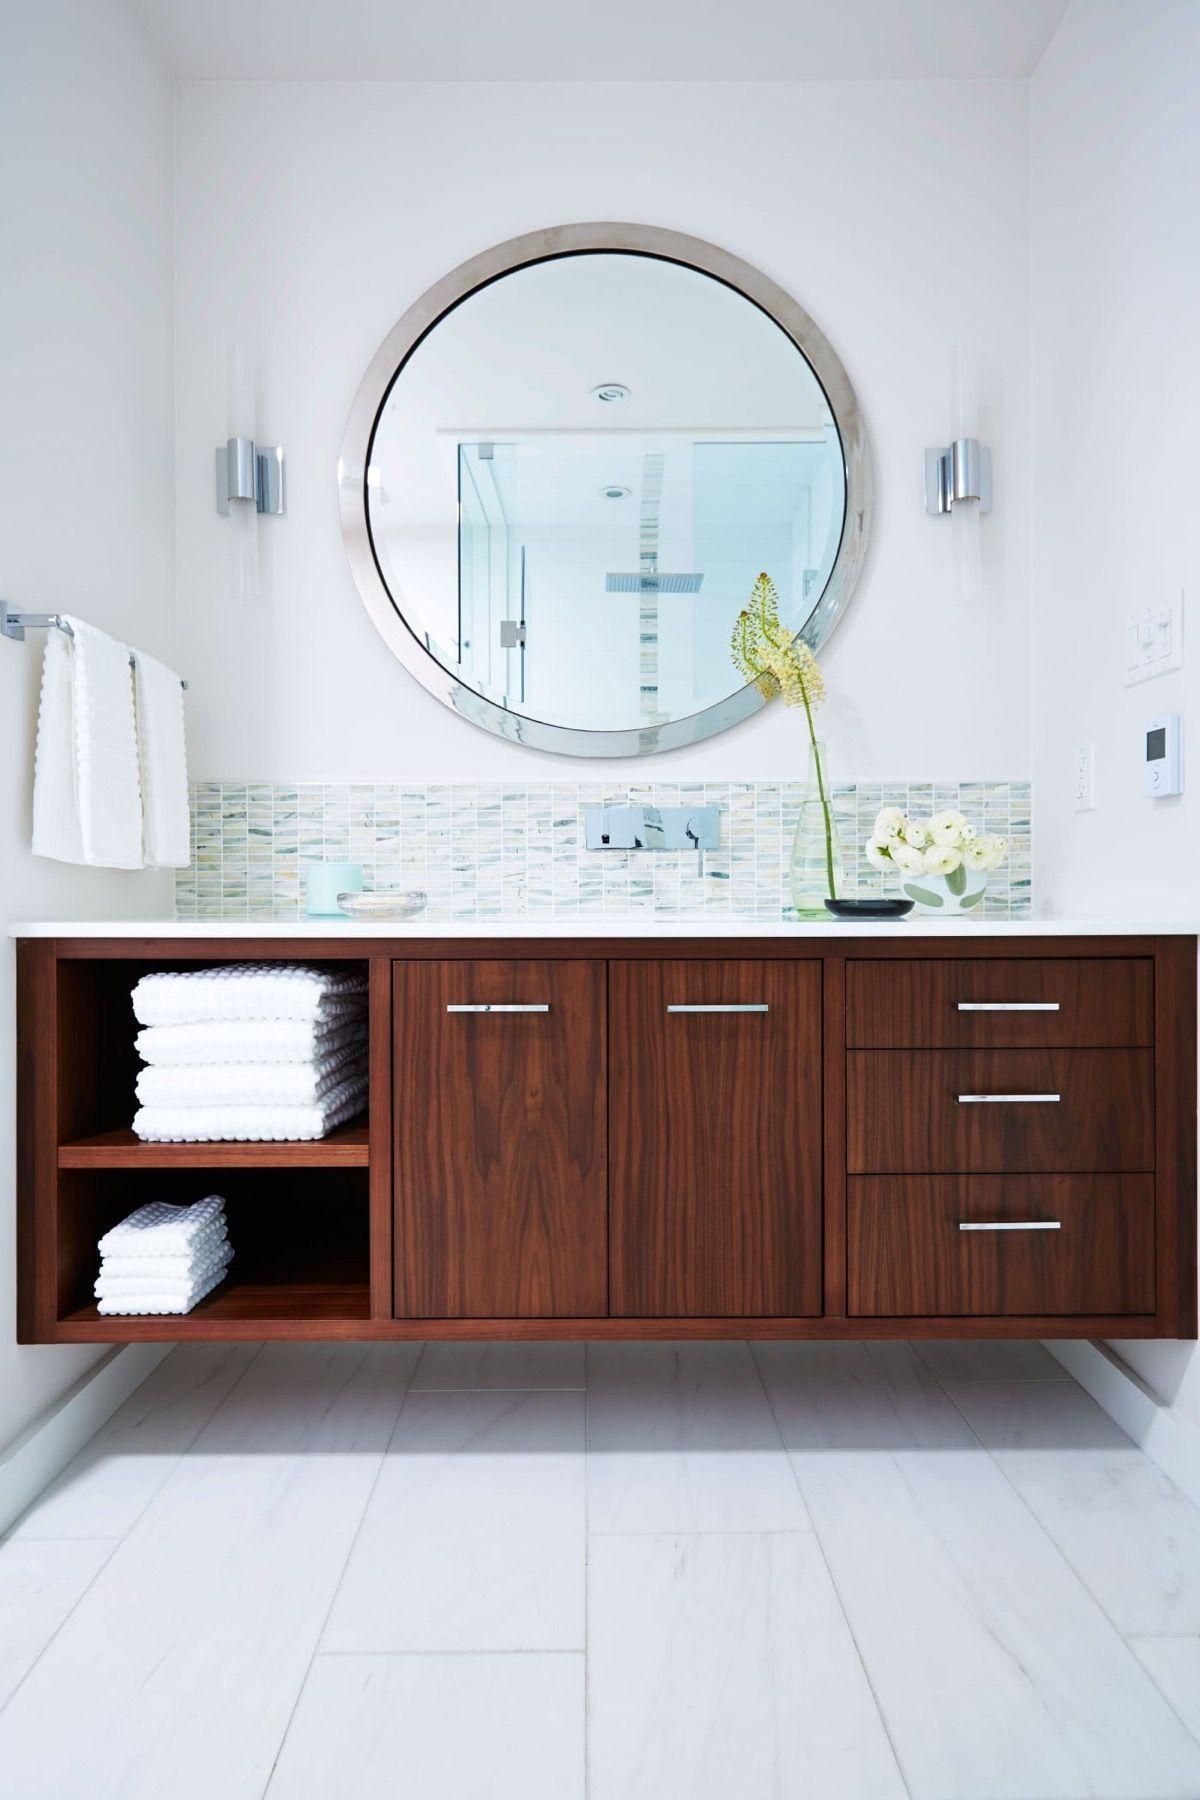 40 Modern Bathroom Vanities That Overflow With Style Modern Bathroom Vanity Modern Bathroom Mid Century Modern Bathroom [ 1800 x 1200 Pixel ]